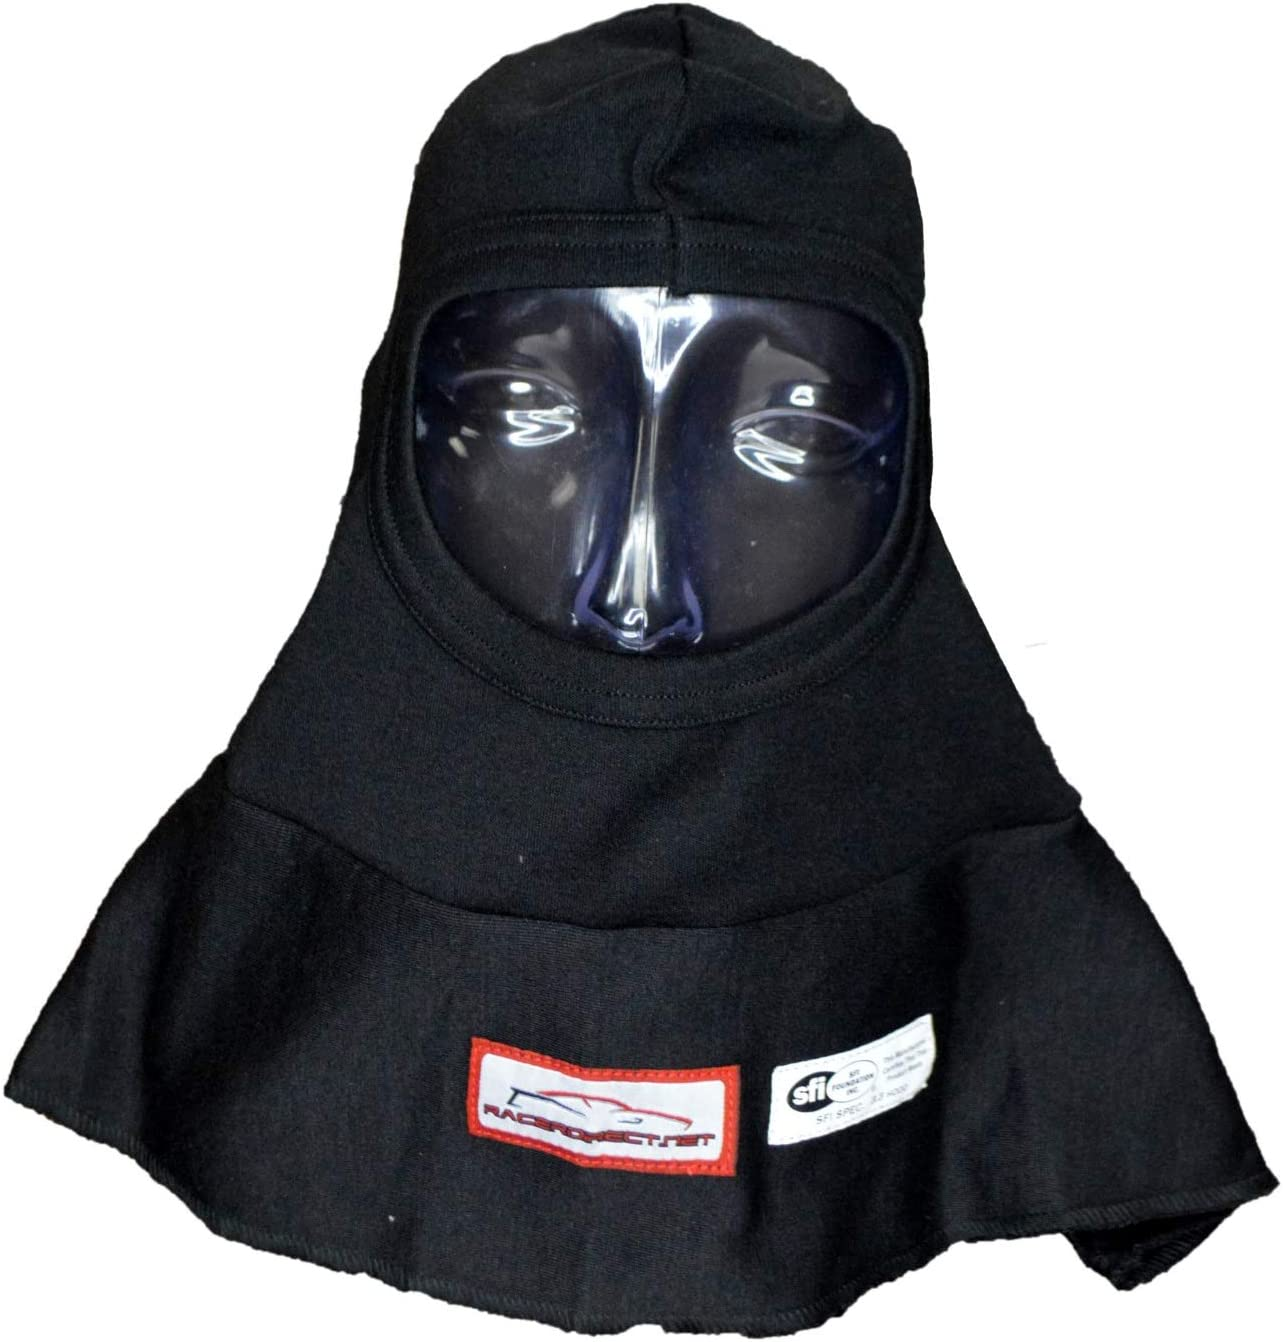 RACERDIRECT Kids Racing Hood Helmet Balaclava SFI 3.3 Full FACE Head Sock Black